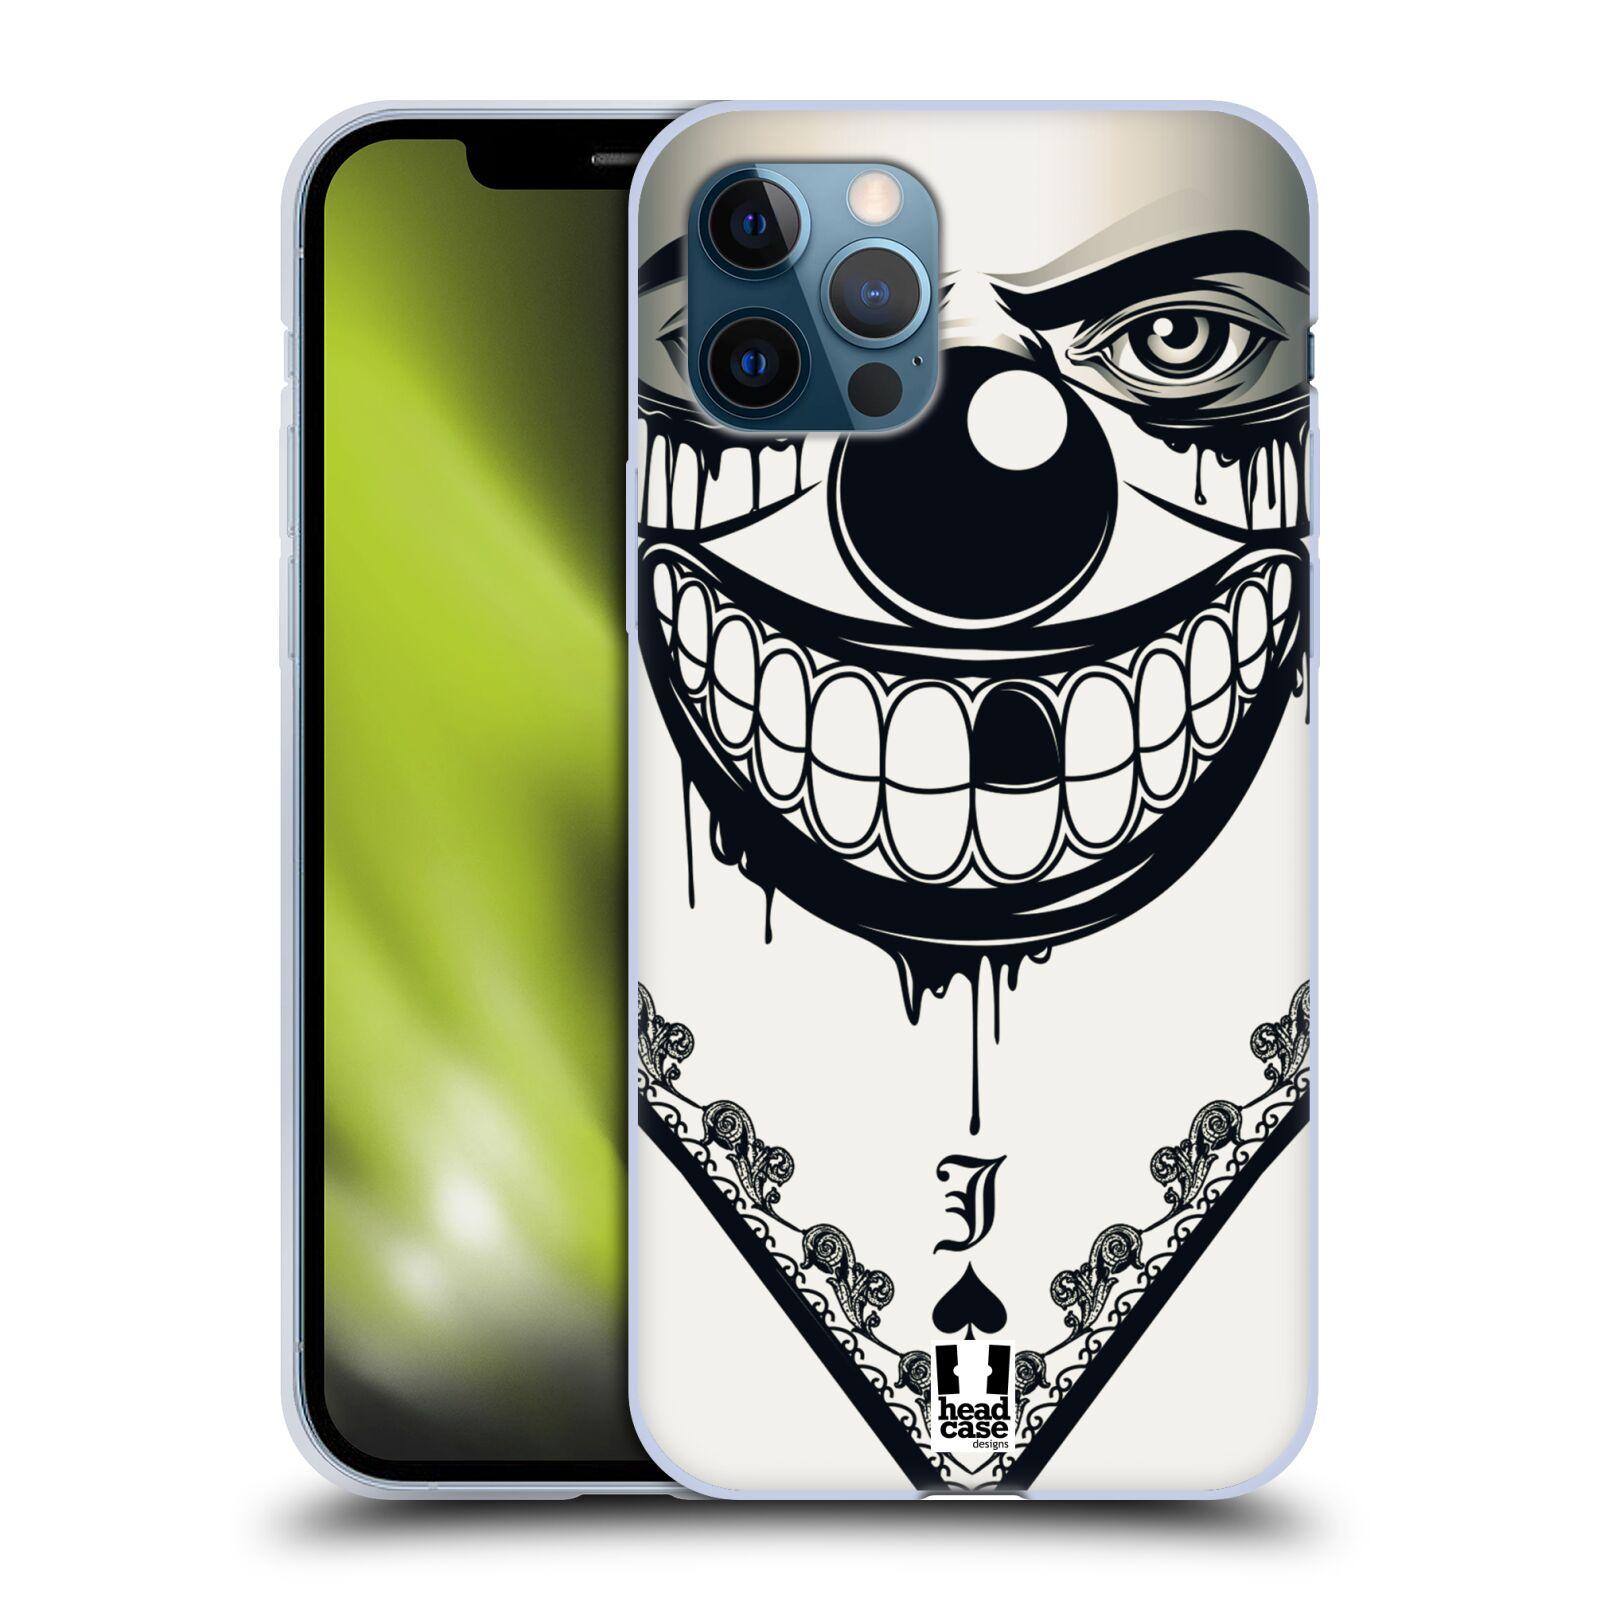 Silikonové pouzdro na mobil Apple iPhone 12 / 12 Pro - Head Case - ZLEJ KLAUN